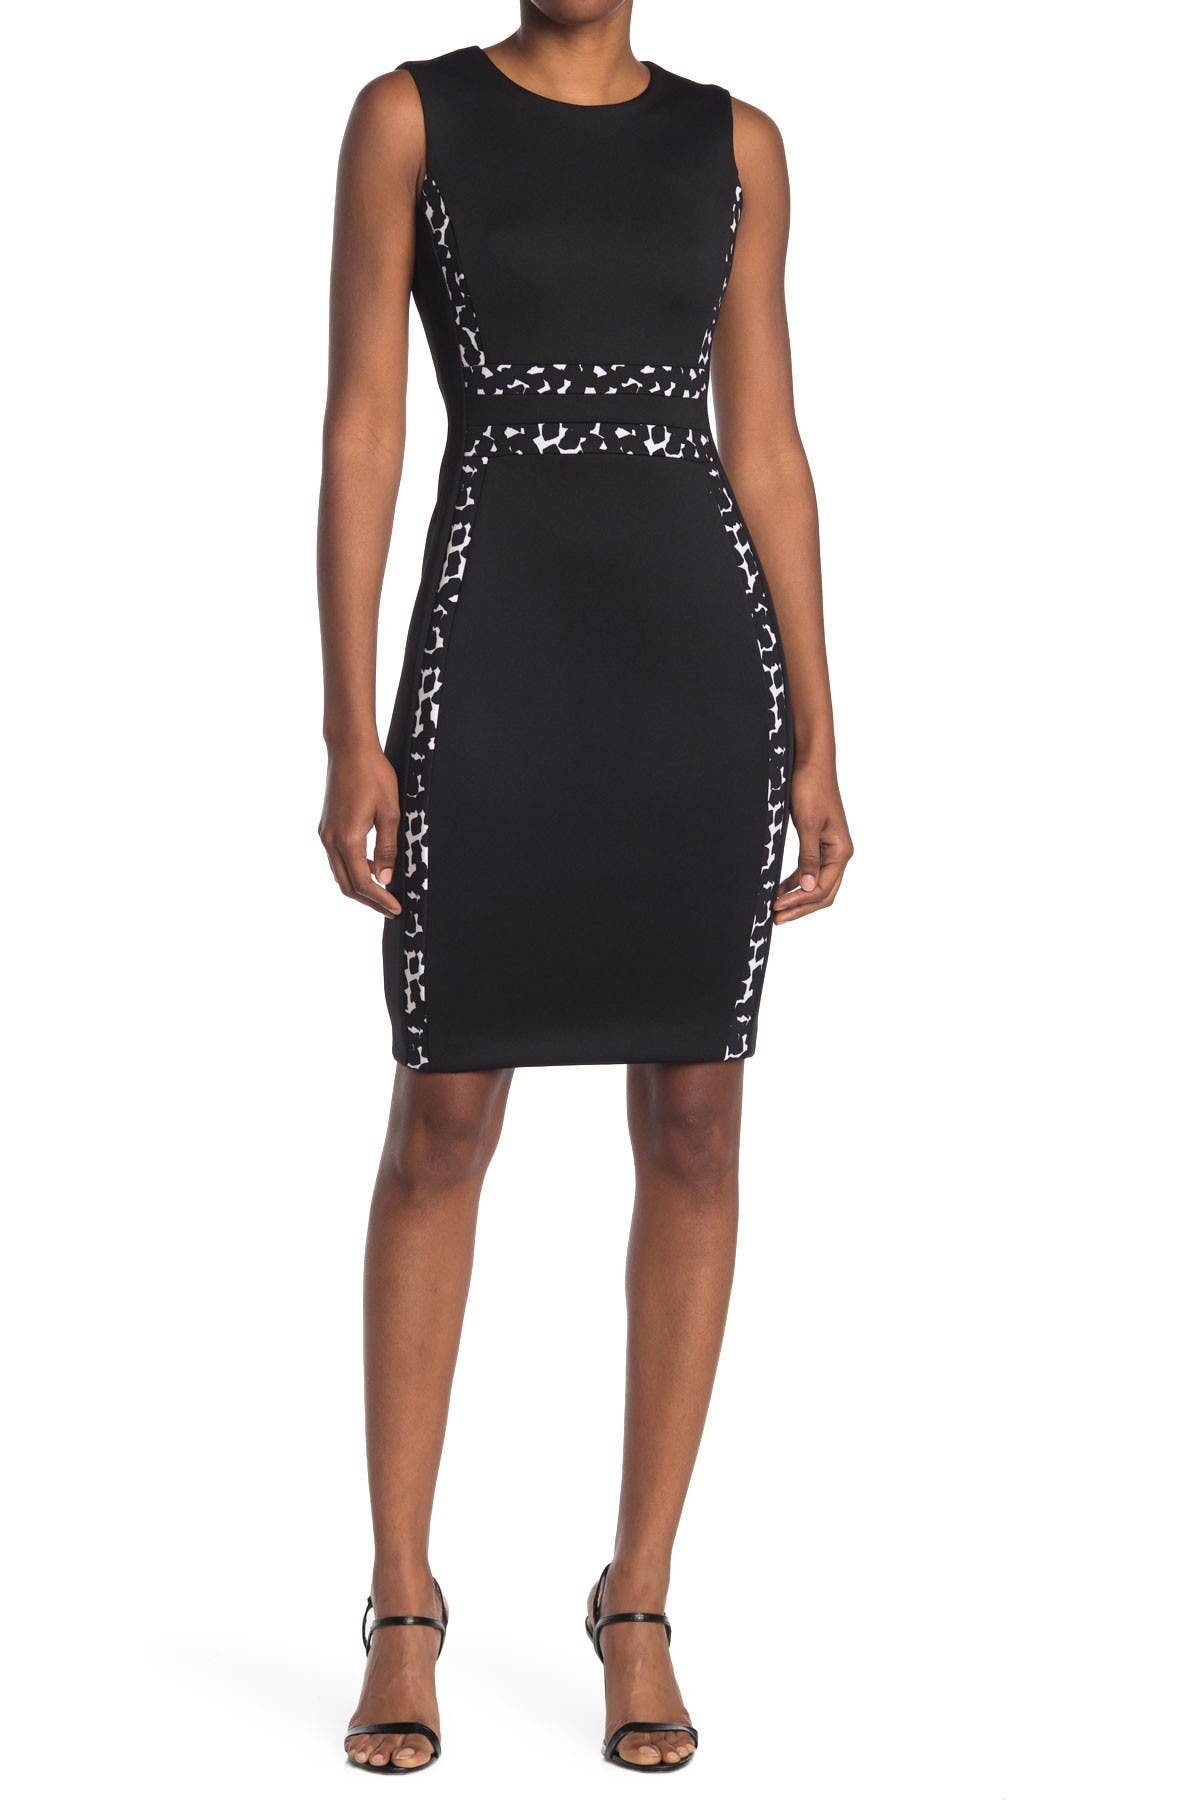 Image of Calvin Klein Dot Trim Sheath Dress